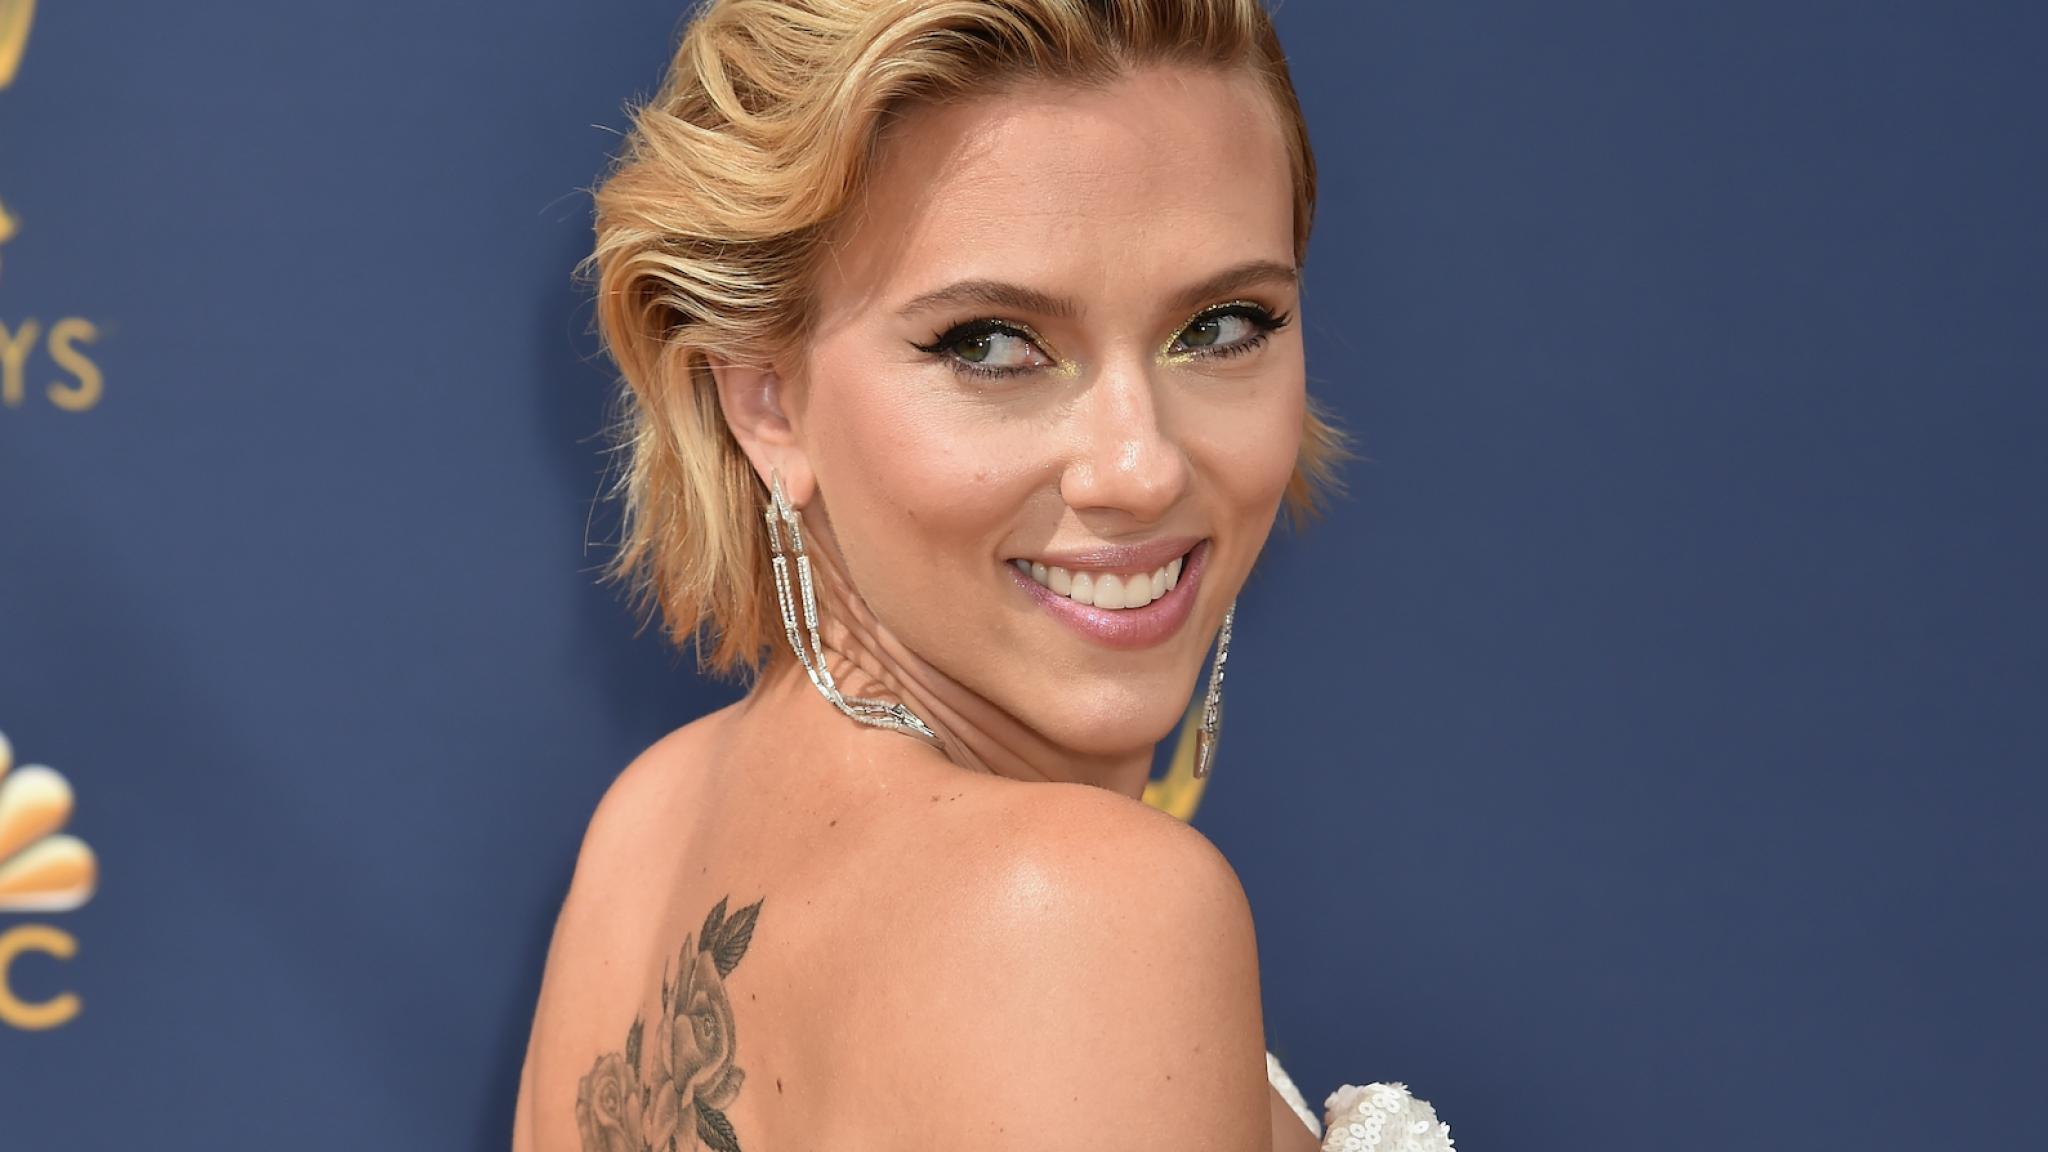 Heftig! Scarlett Johansson slachtoffer van deepfake-porno